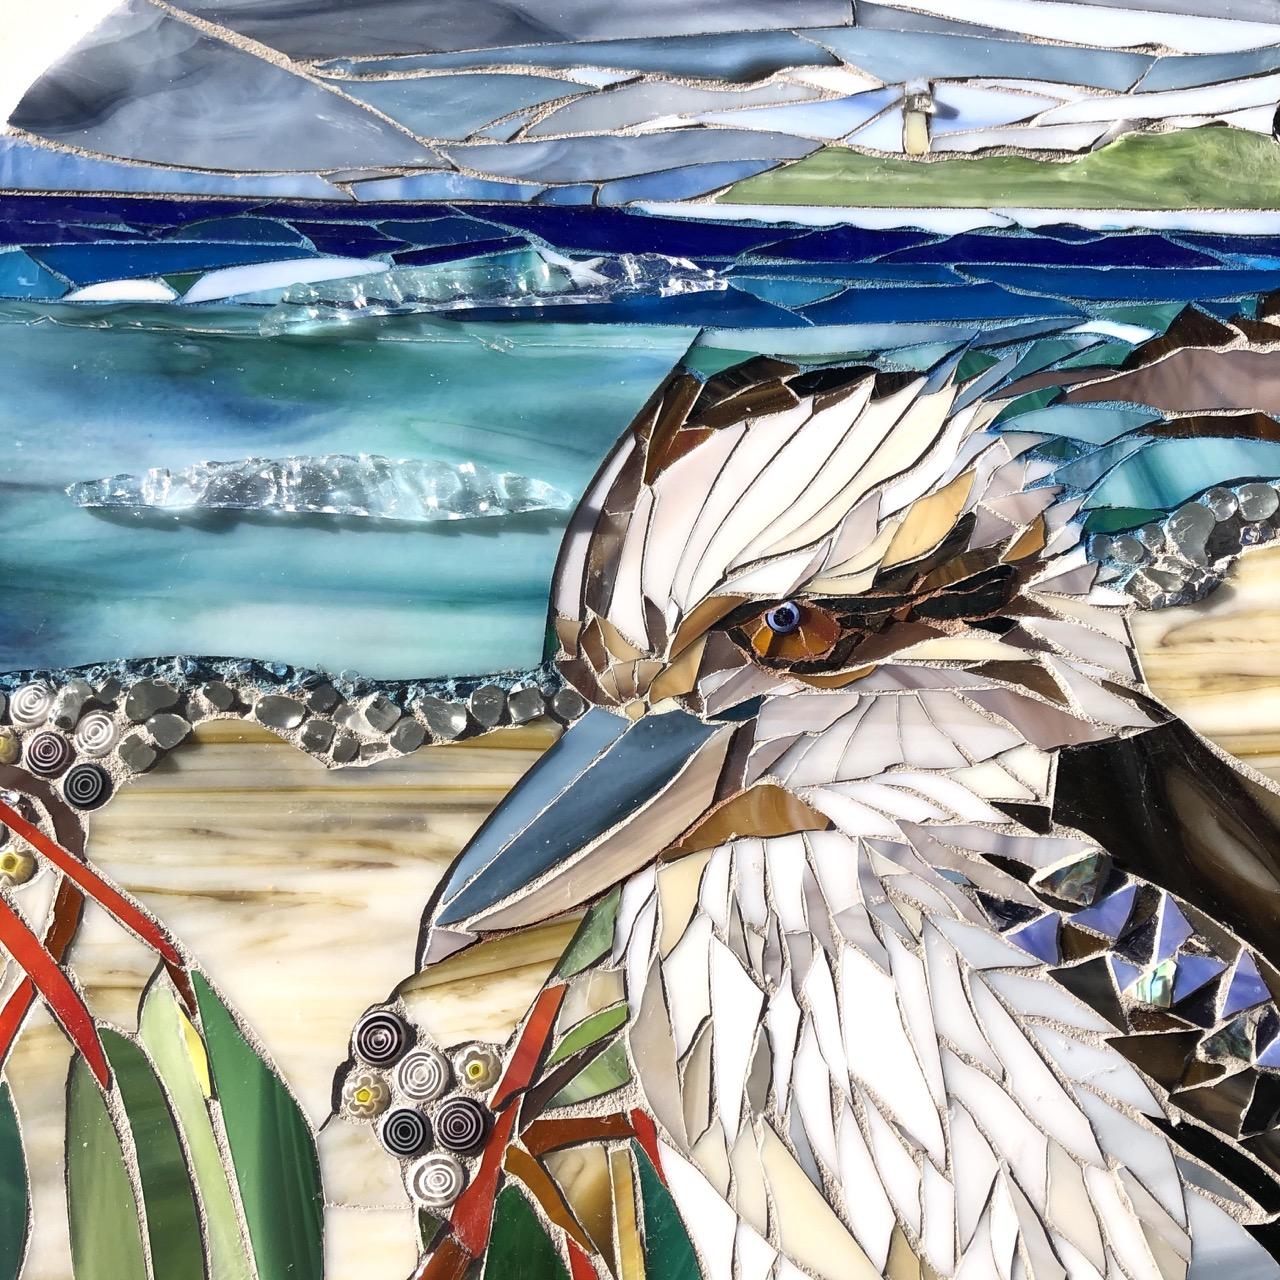 kookaburra_mosaic1.jpg